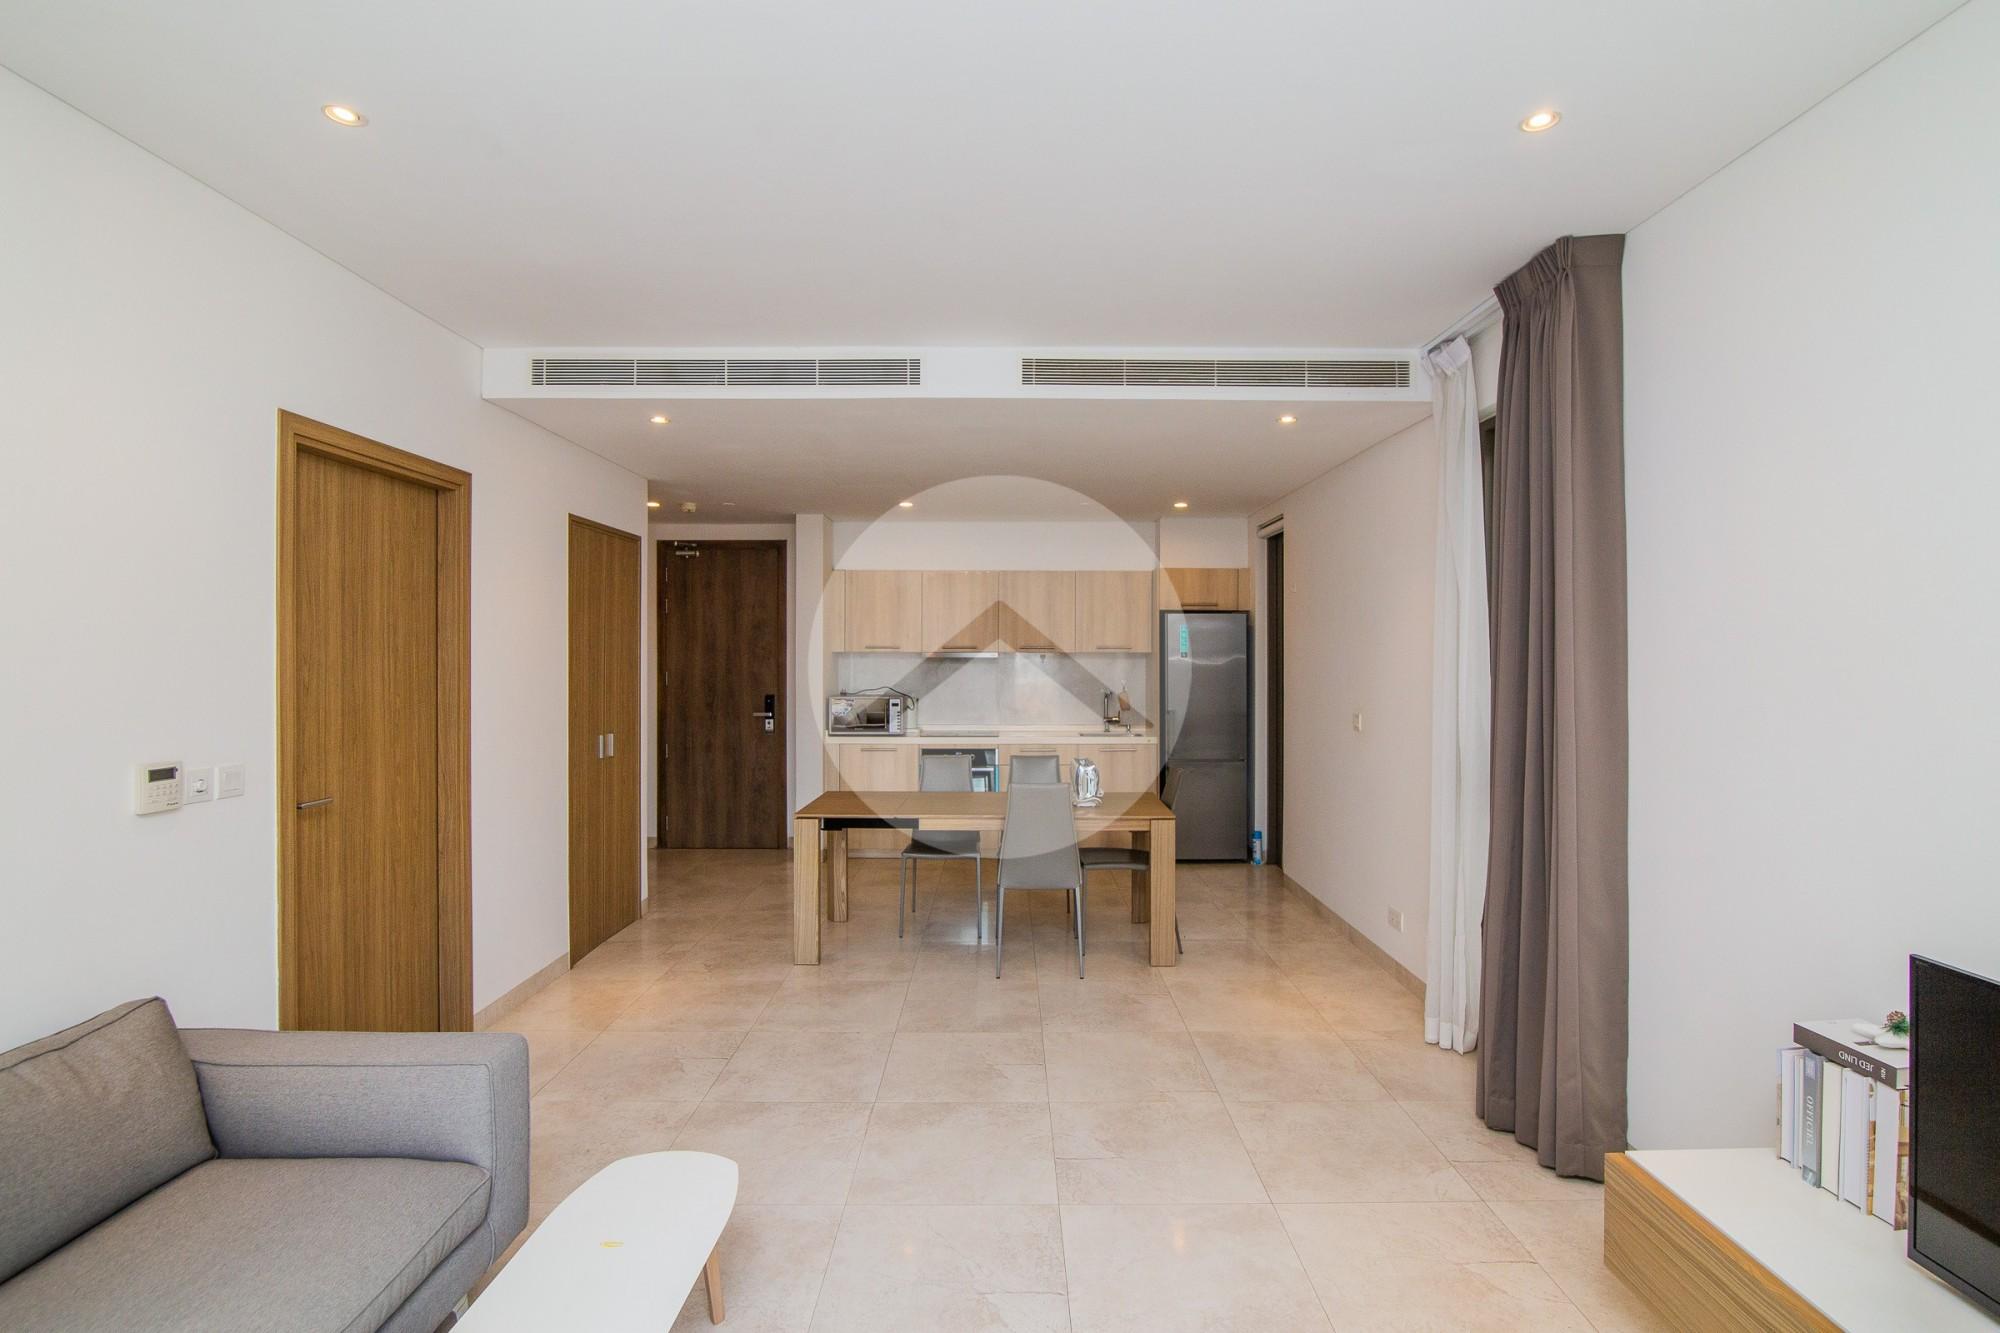 1 Bedroom Condo For Rent - Tonle Bassac, Phnom Penh